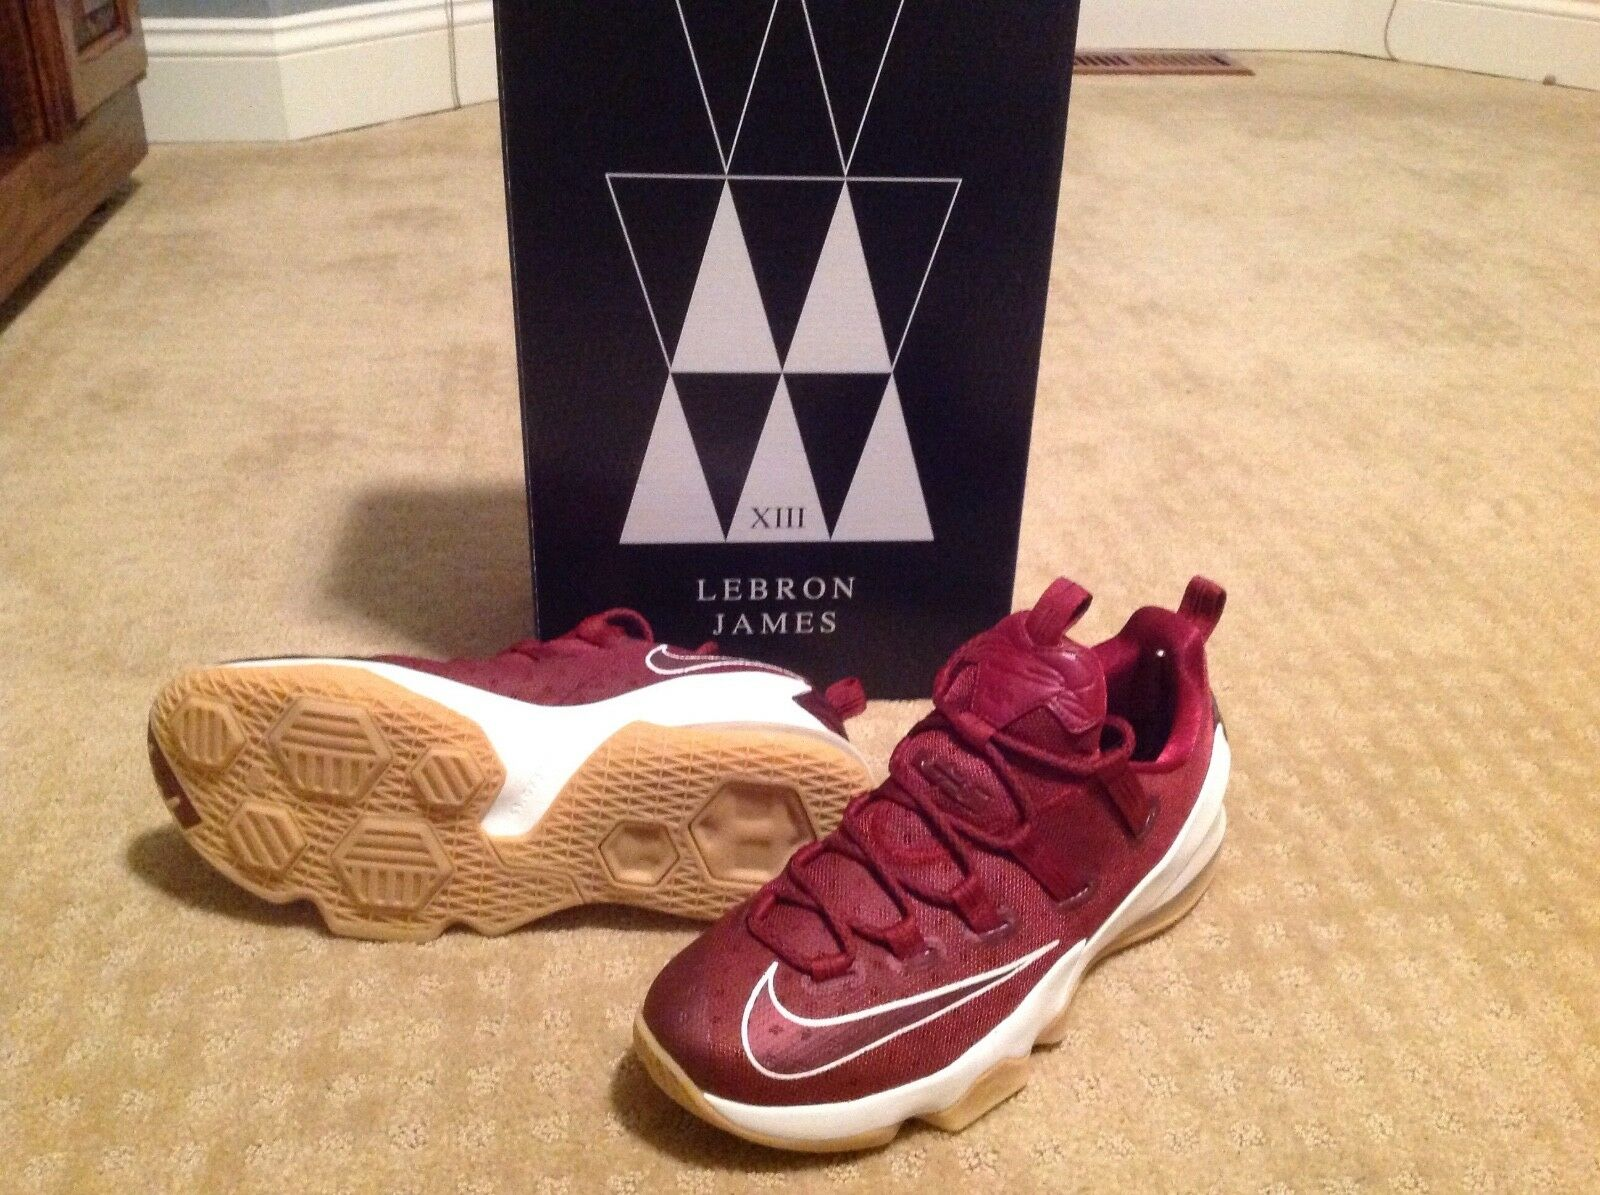 da81628aa2 Lebron Men's Low Cut Basketball shoes NIB James XIII ntrudb6508-Athletic  Shoes